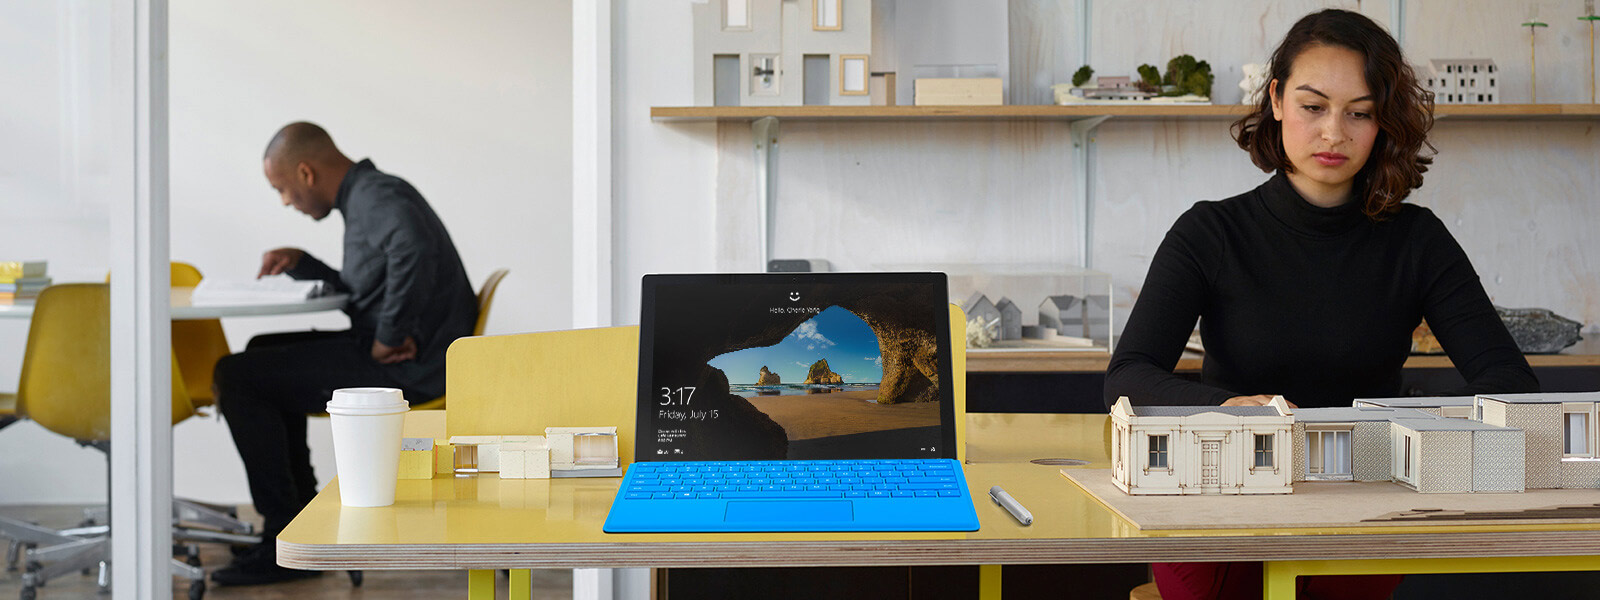 桌上放著 Surface Pro 4 與 Surface 手寫筆。